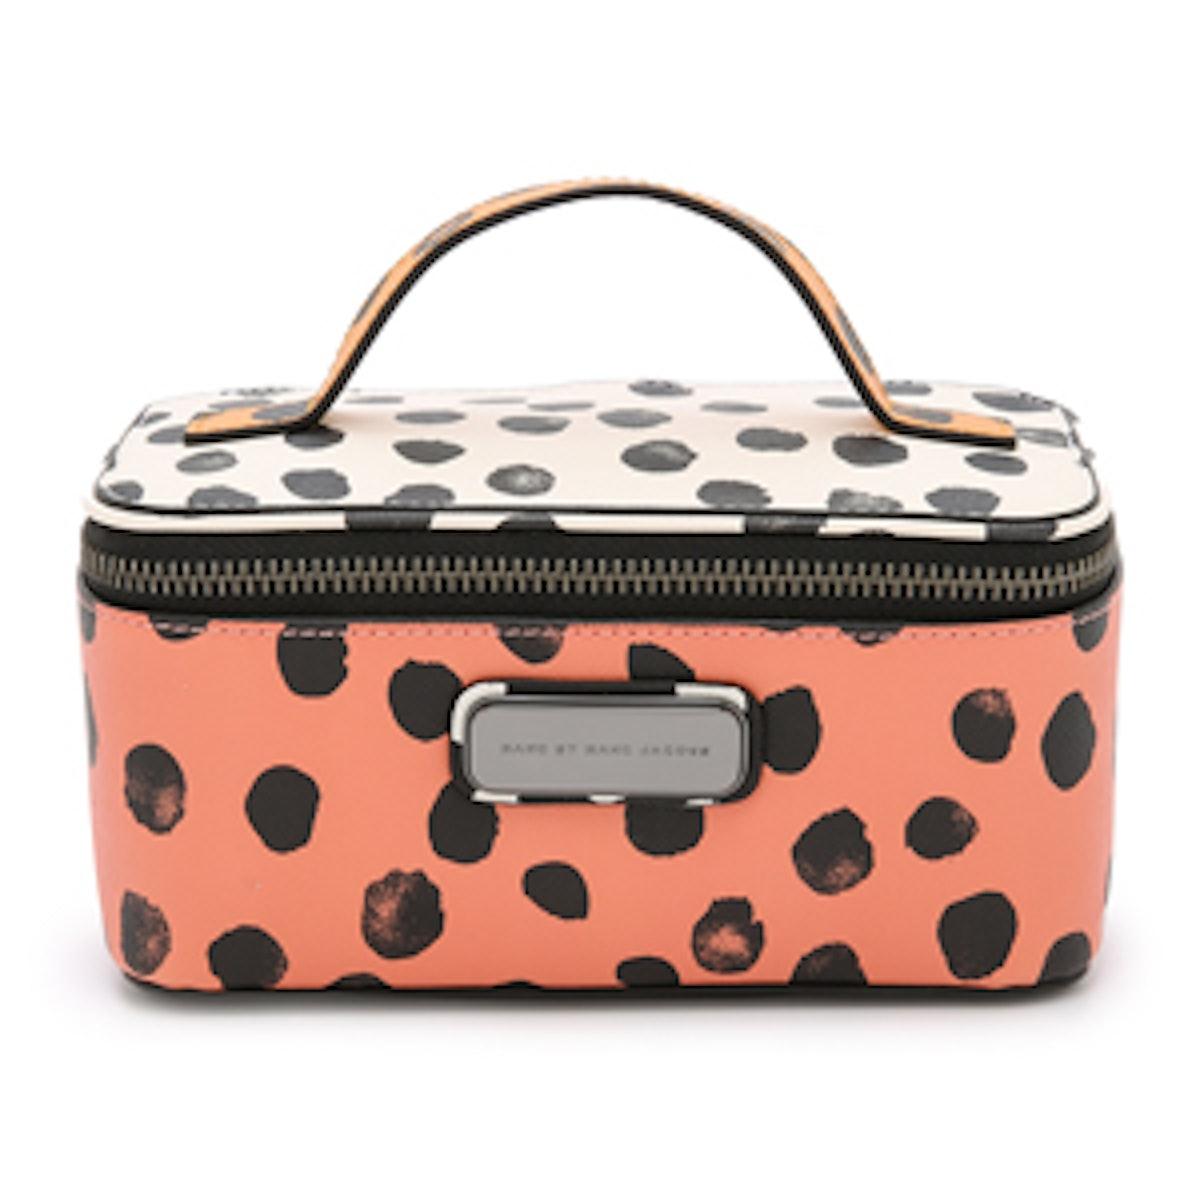 Sophisticato Small Cosmetic Bag